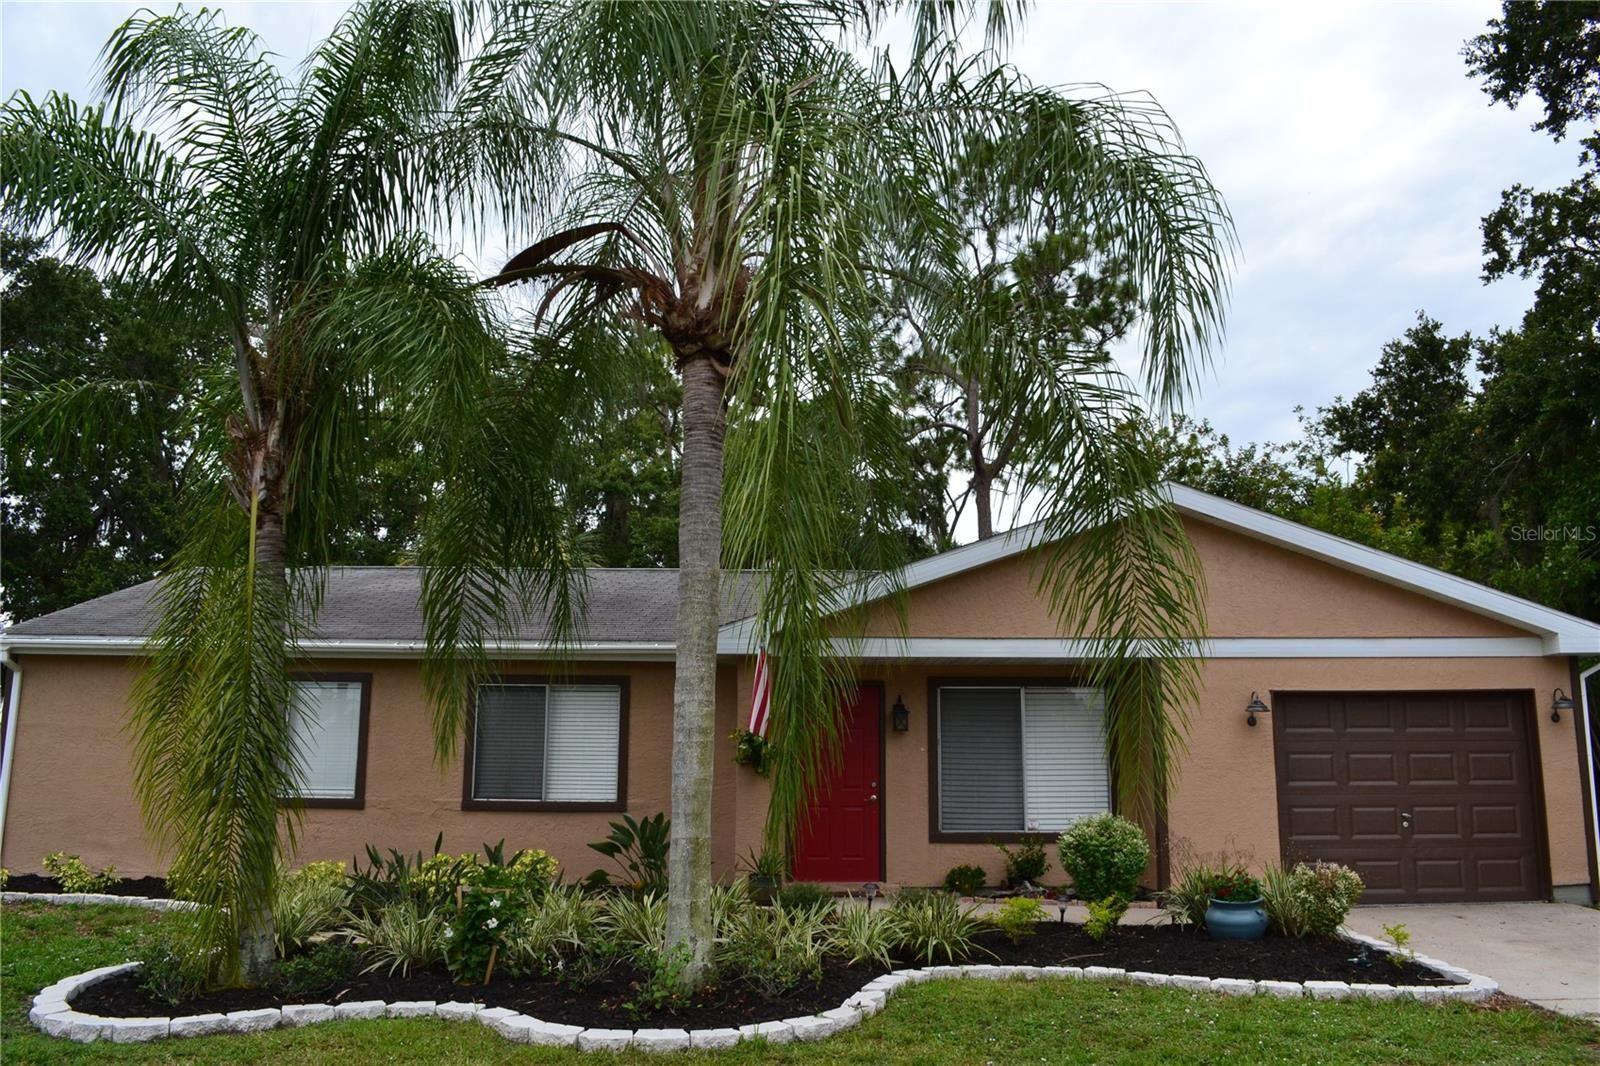 Photo of 4437 MARALDO AVENUE, NORTH PORT, FL 34287 (MLS # A4507210)